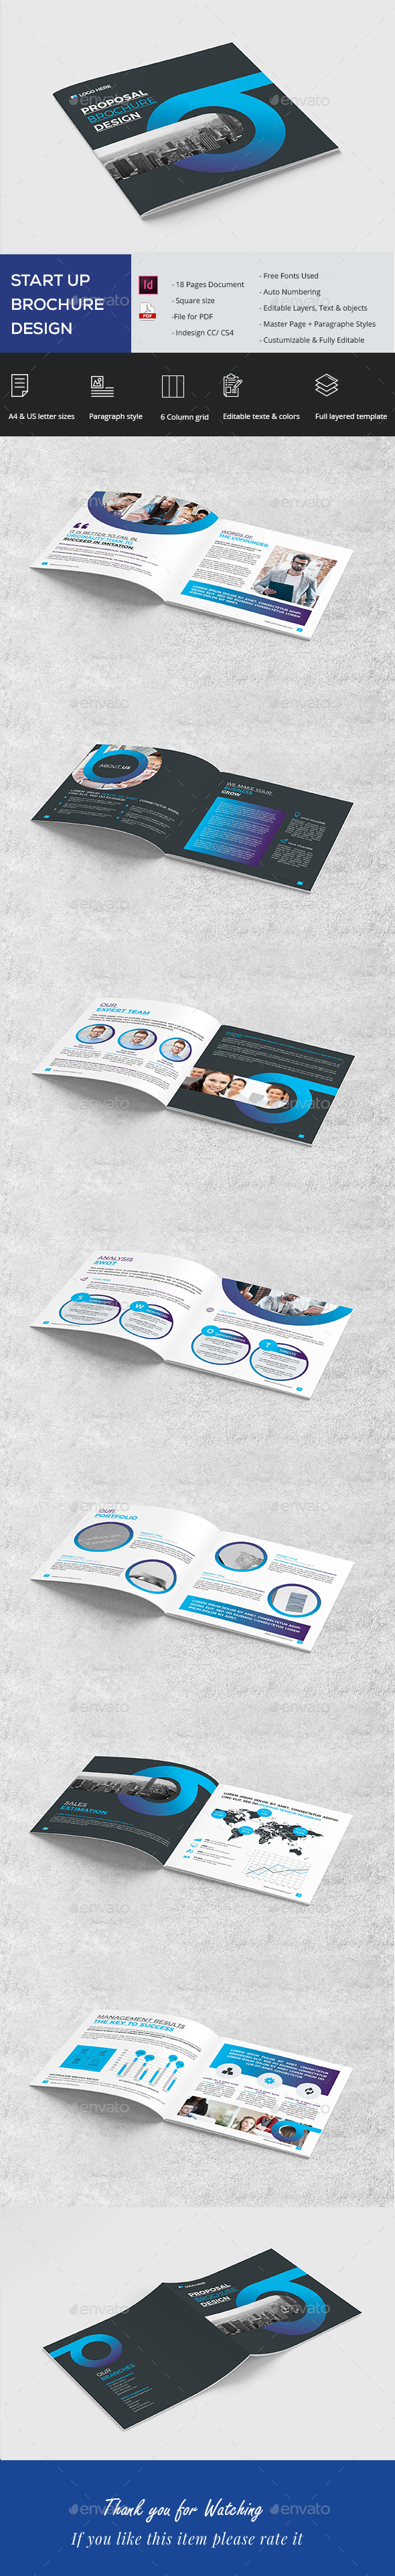 Square Proposal Brochure - Brochures Print Templates